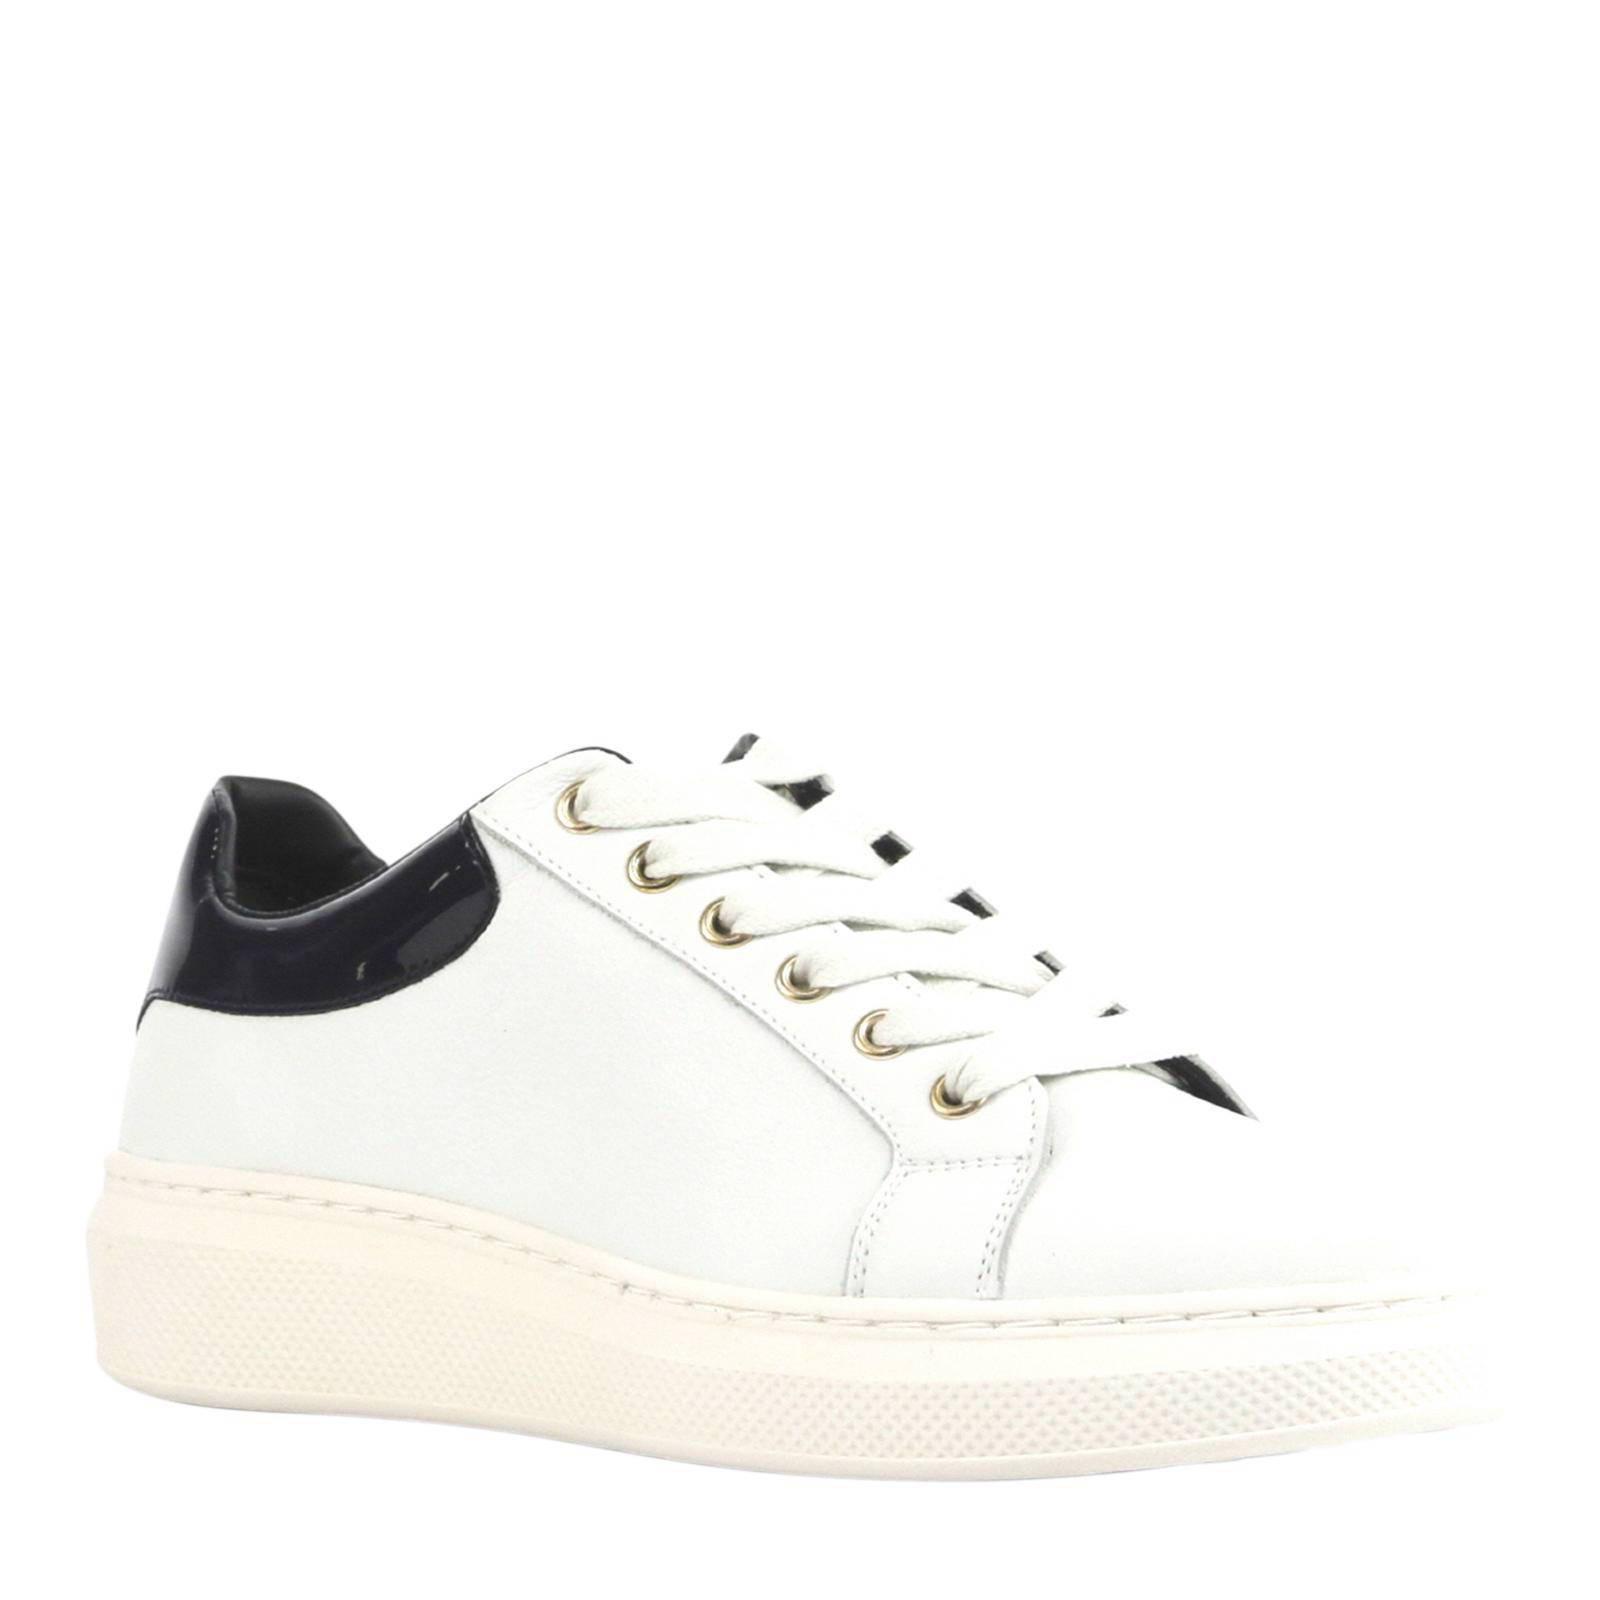 tommy hilfiger sabrina sneakers